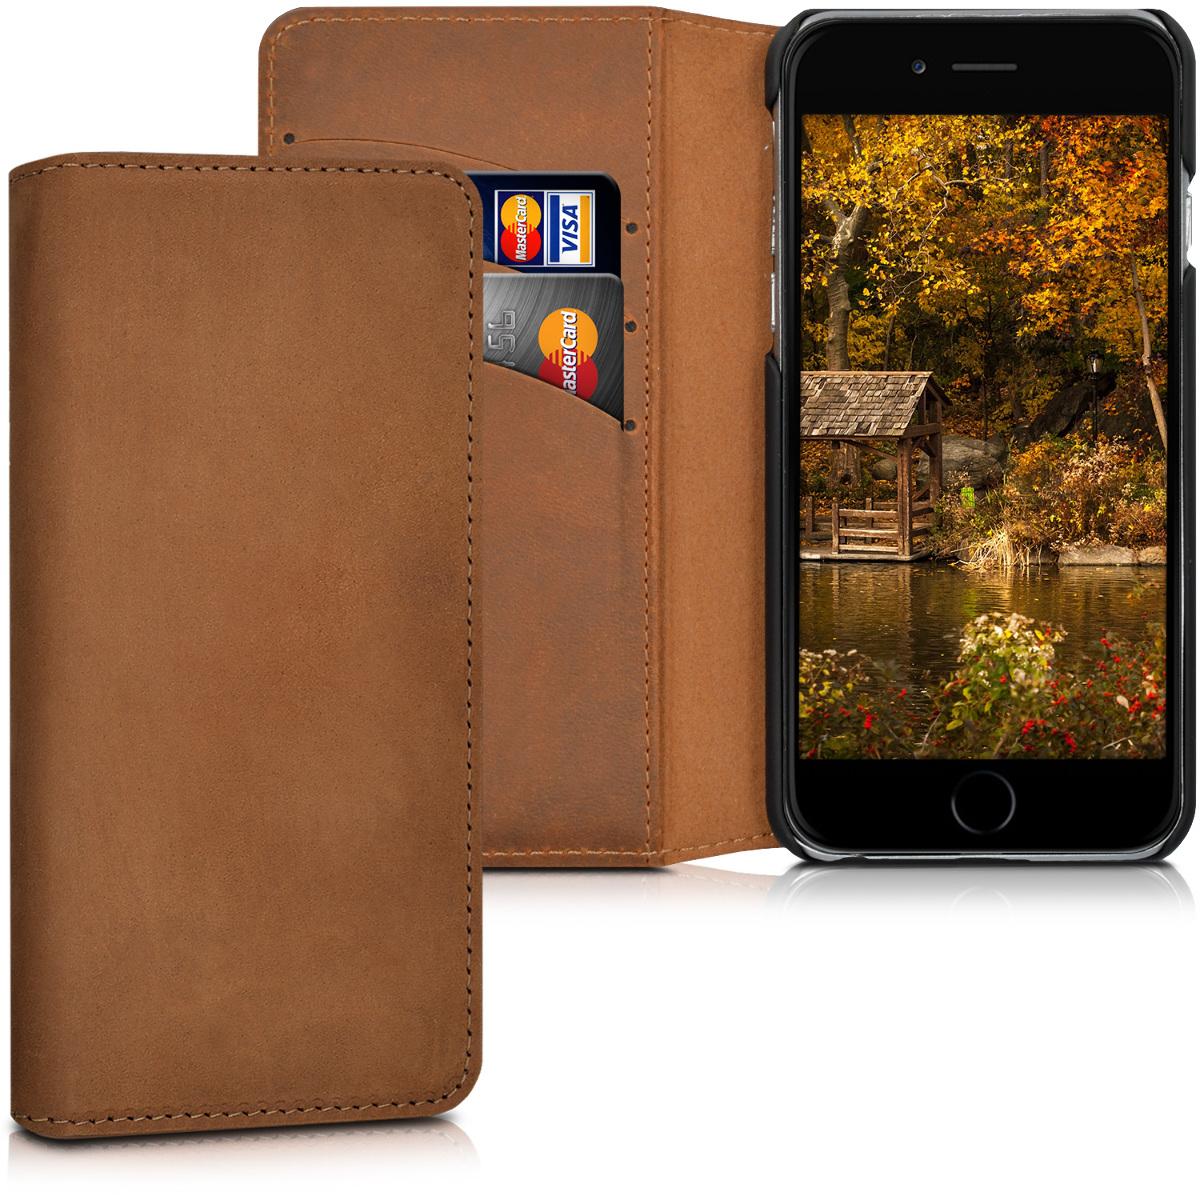 Kalibri Δερμάτινη Suede Θήκη - Πορτοφόλι Apple iPhone 6 / 6S - Cognac (39399.83)